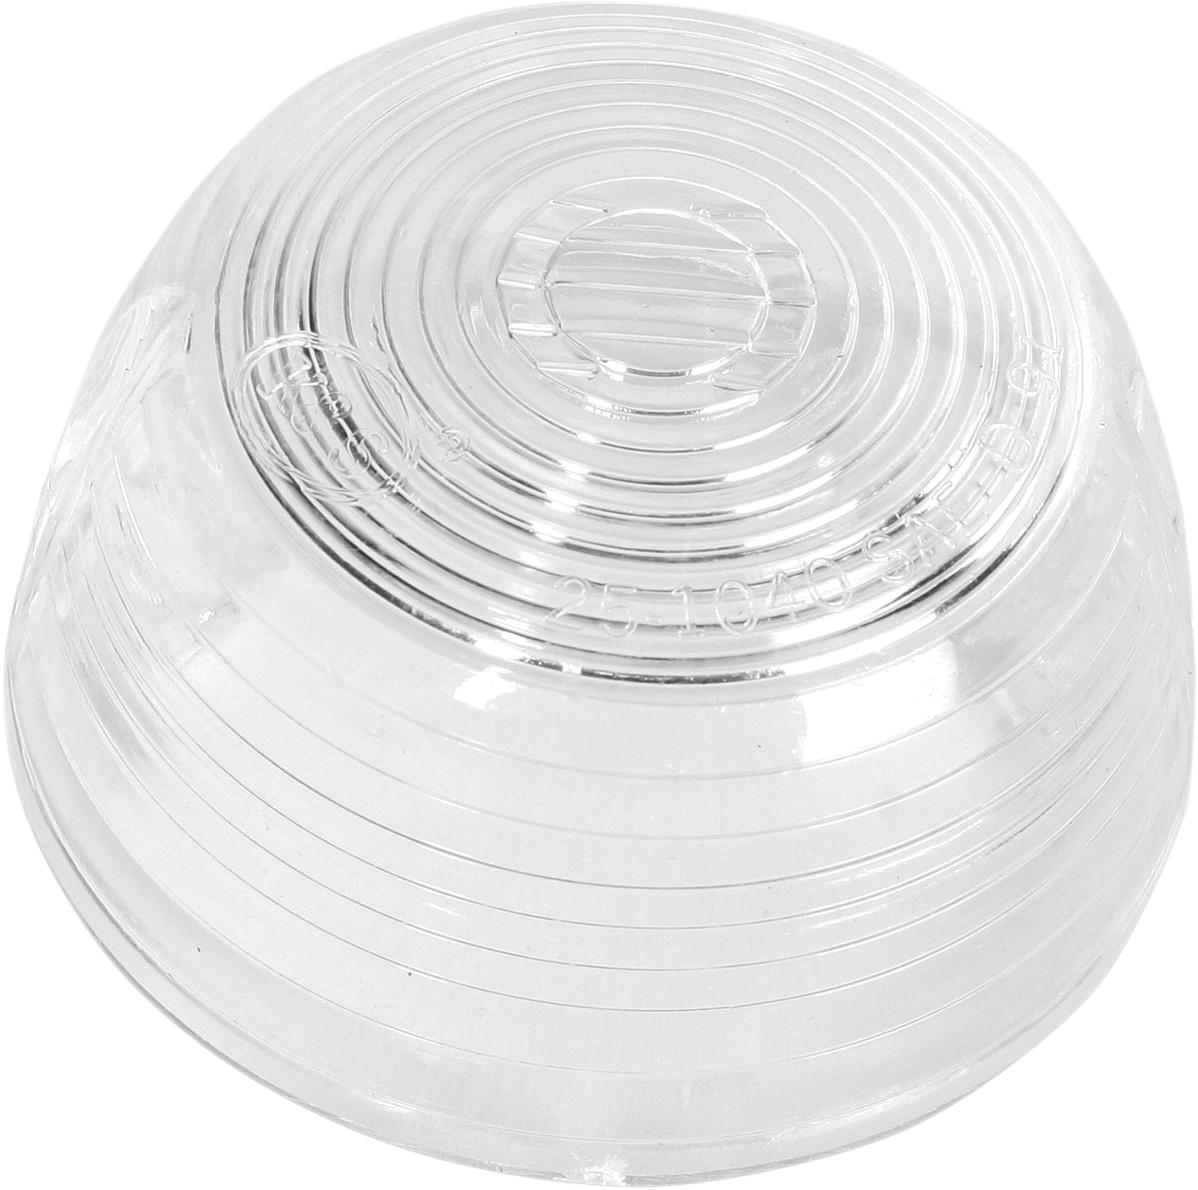 REPLCMNT LENS-CLEAR [25-1040C]